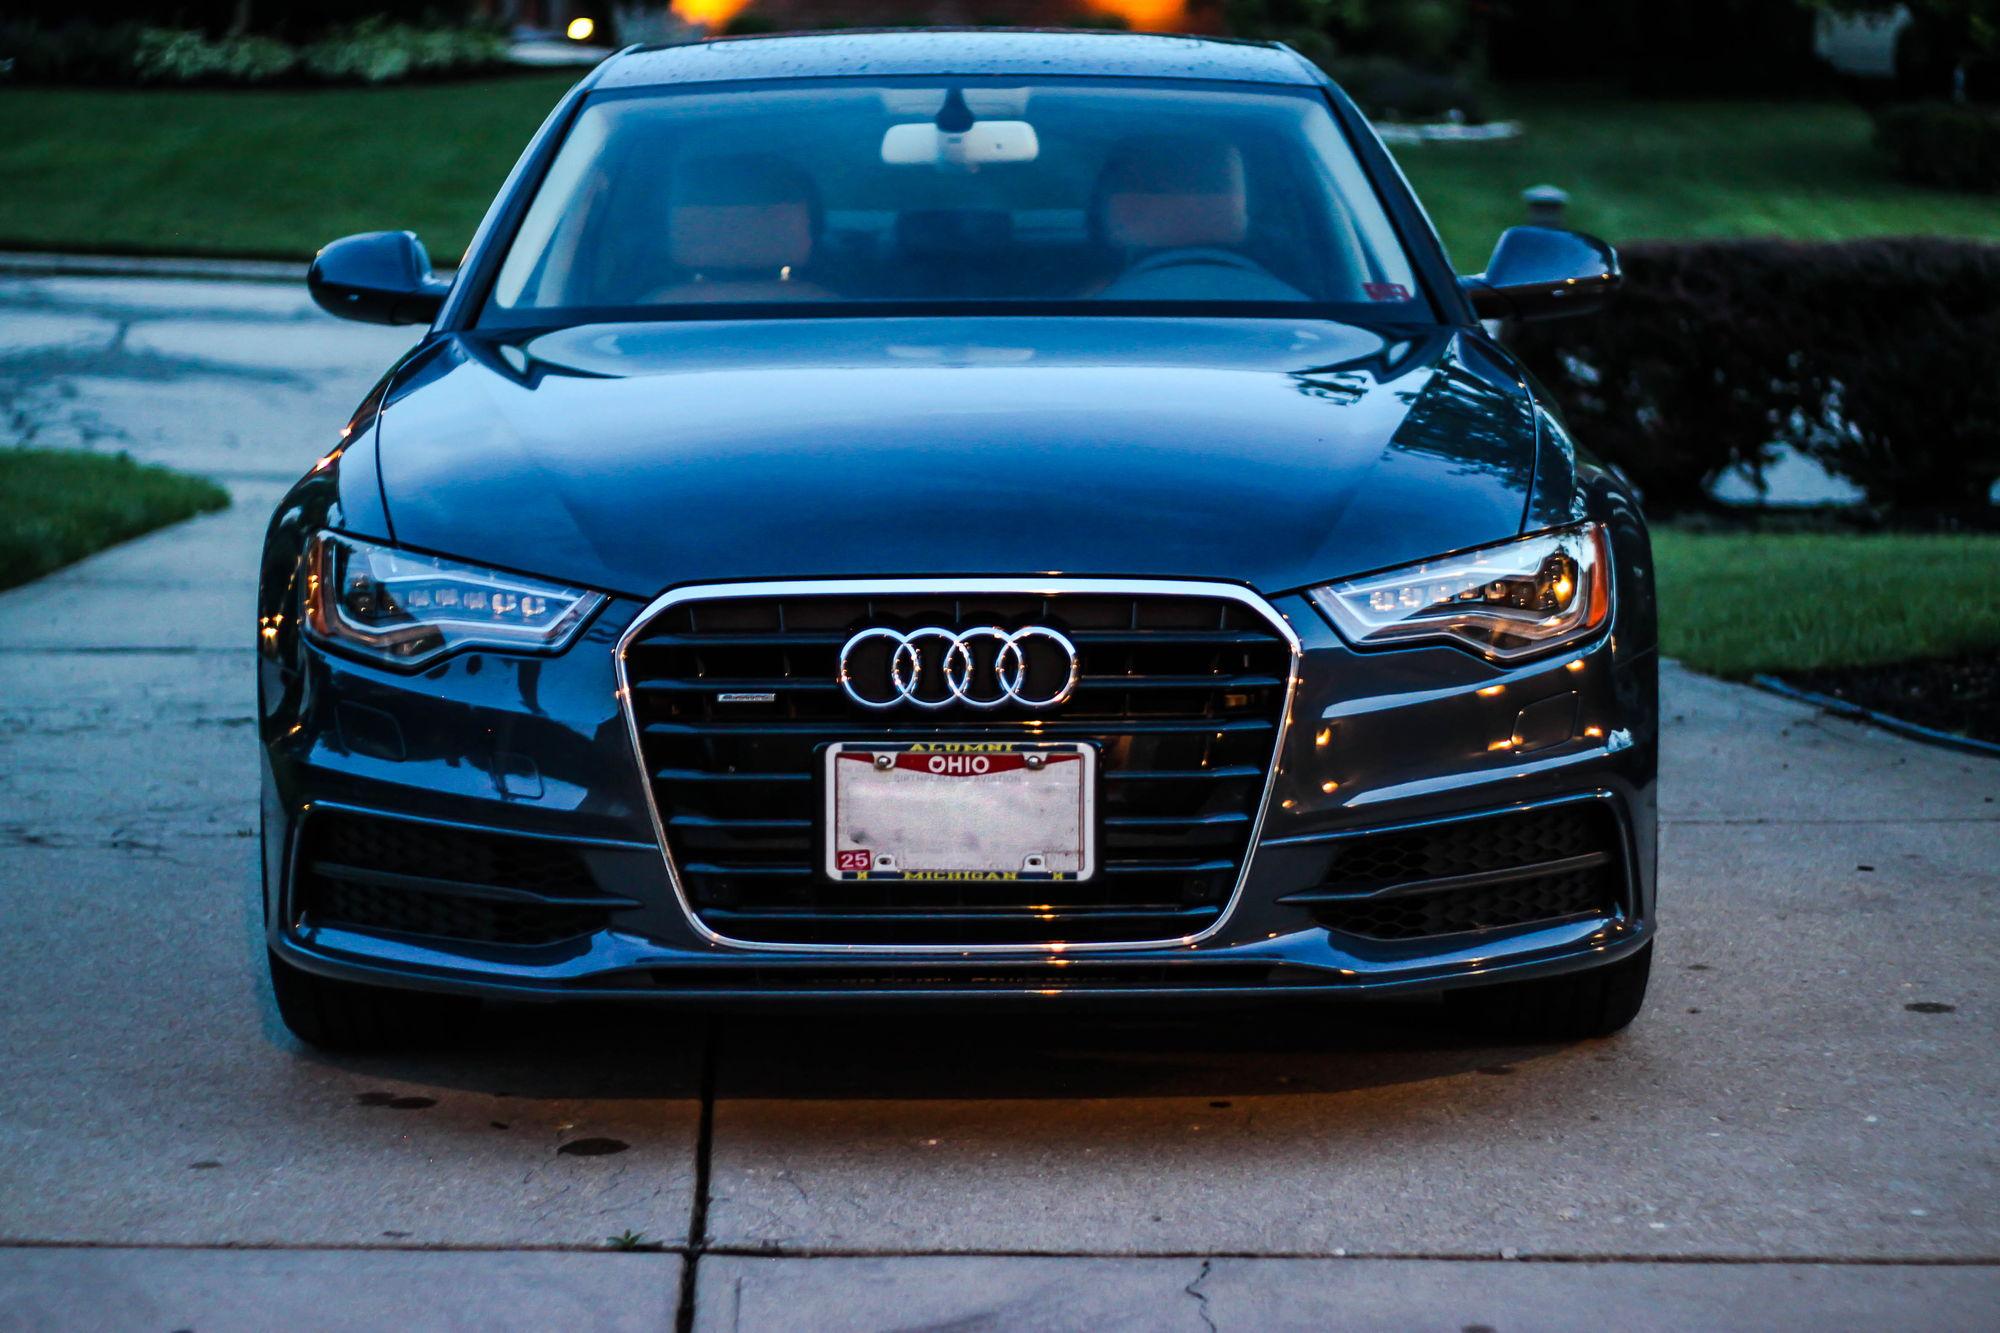 Photos Of The New Car Audiworld Forums